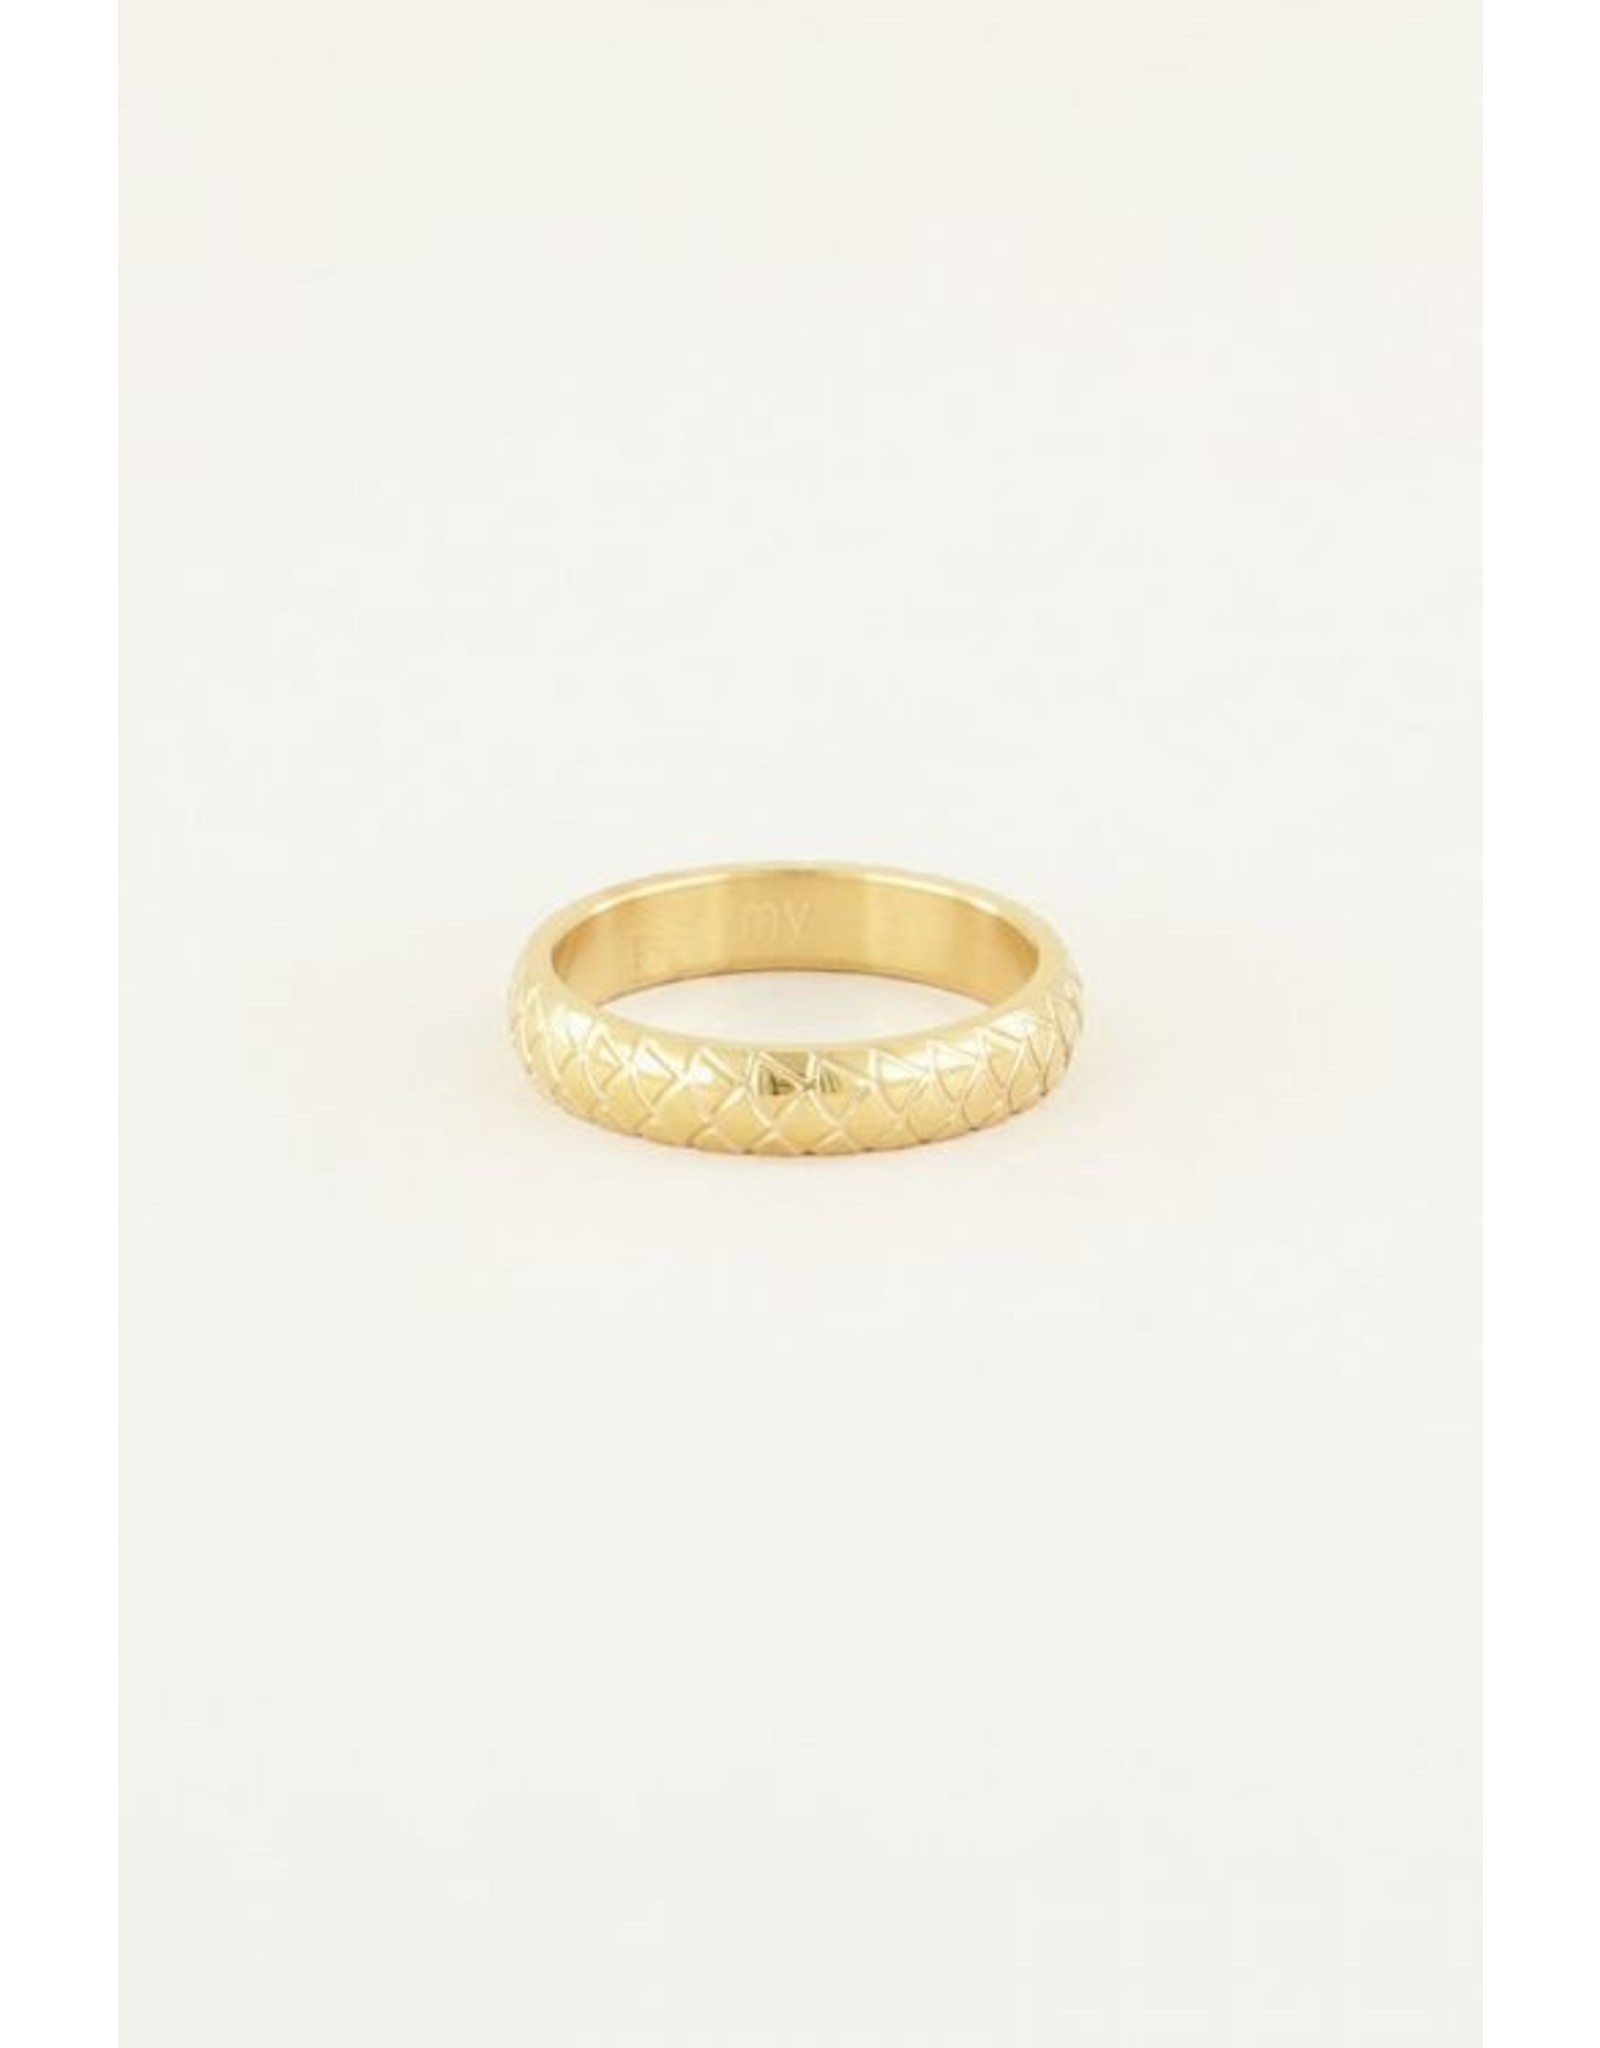 Ring schubben small goud